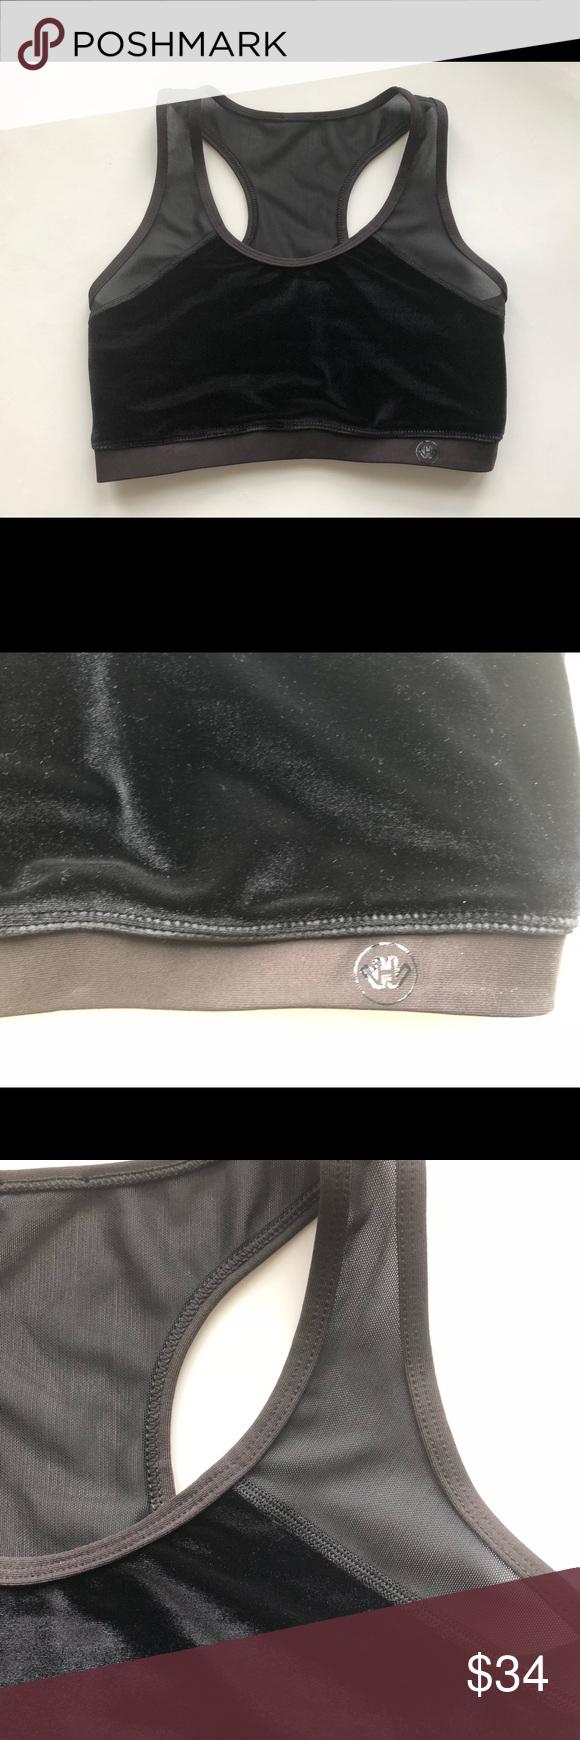 00fee4963ef93 New HOLLIE WATMAN Sports Bra Velvet black mesh Hollie Watman Sports bra  size Small New no